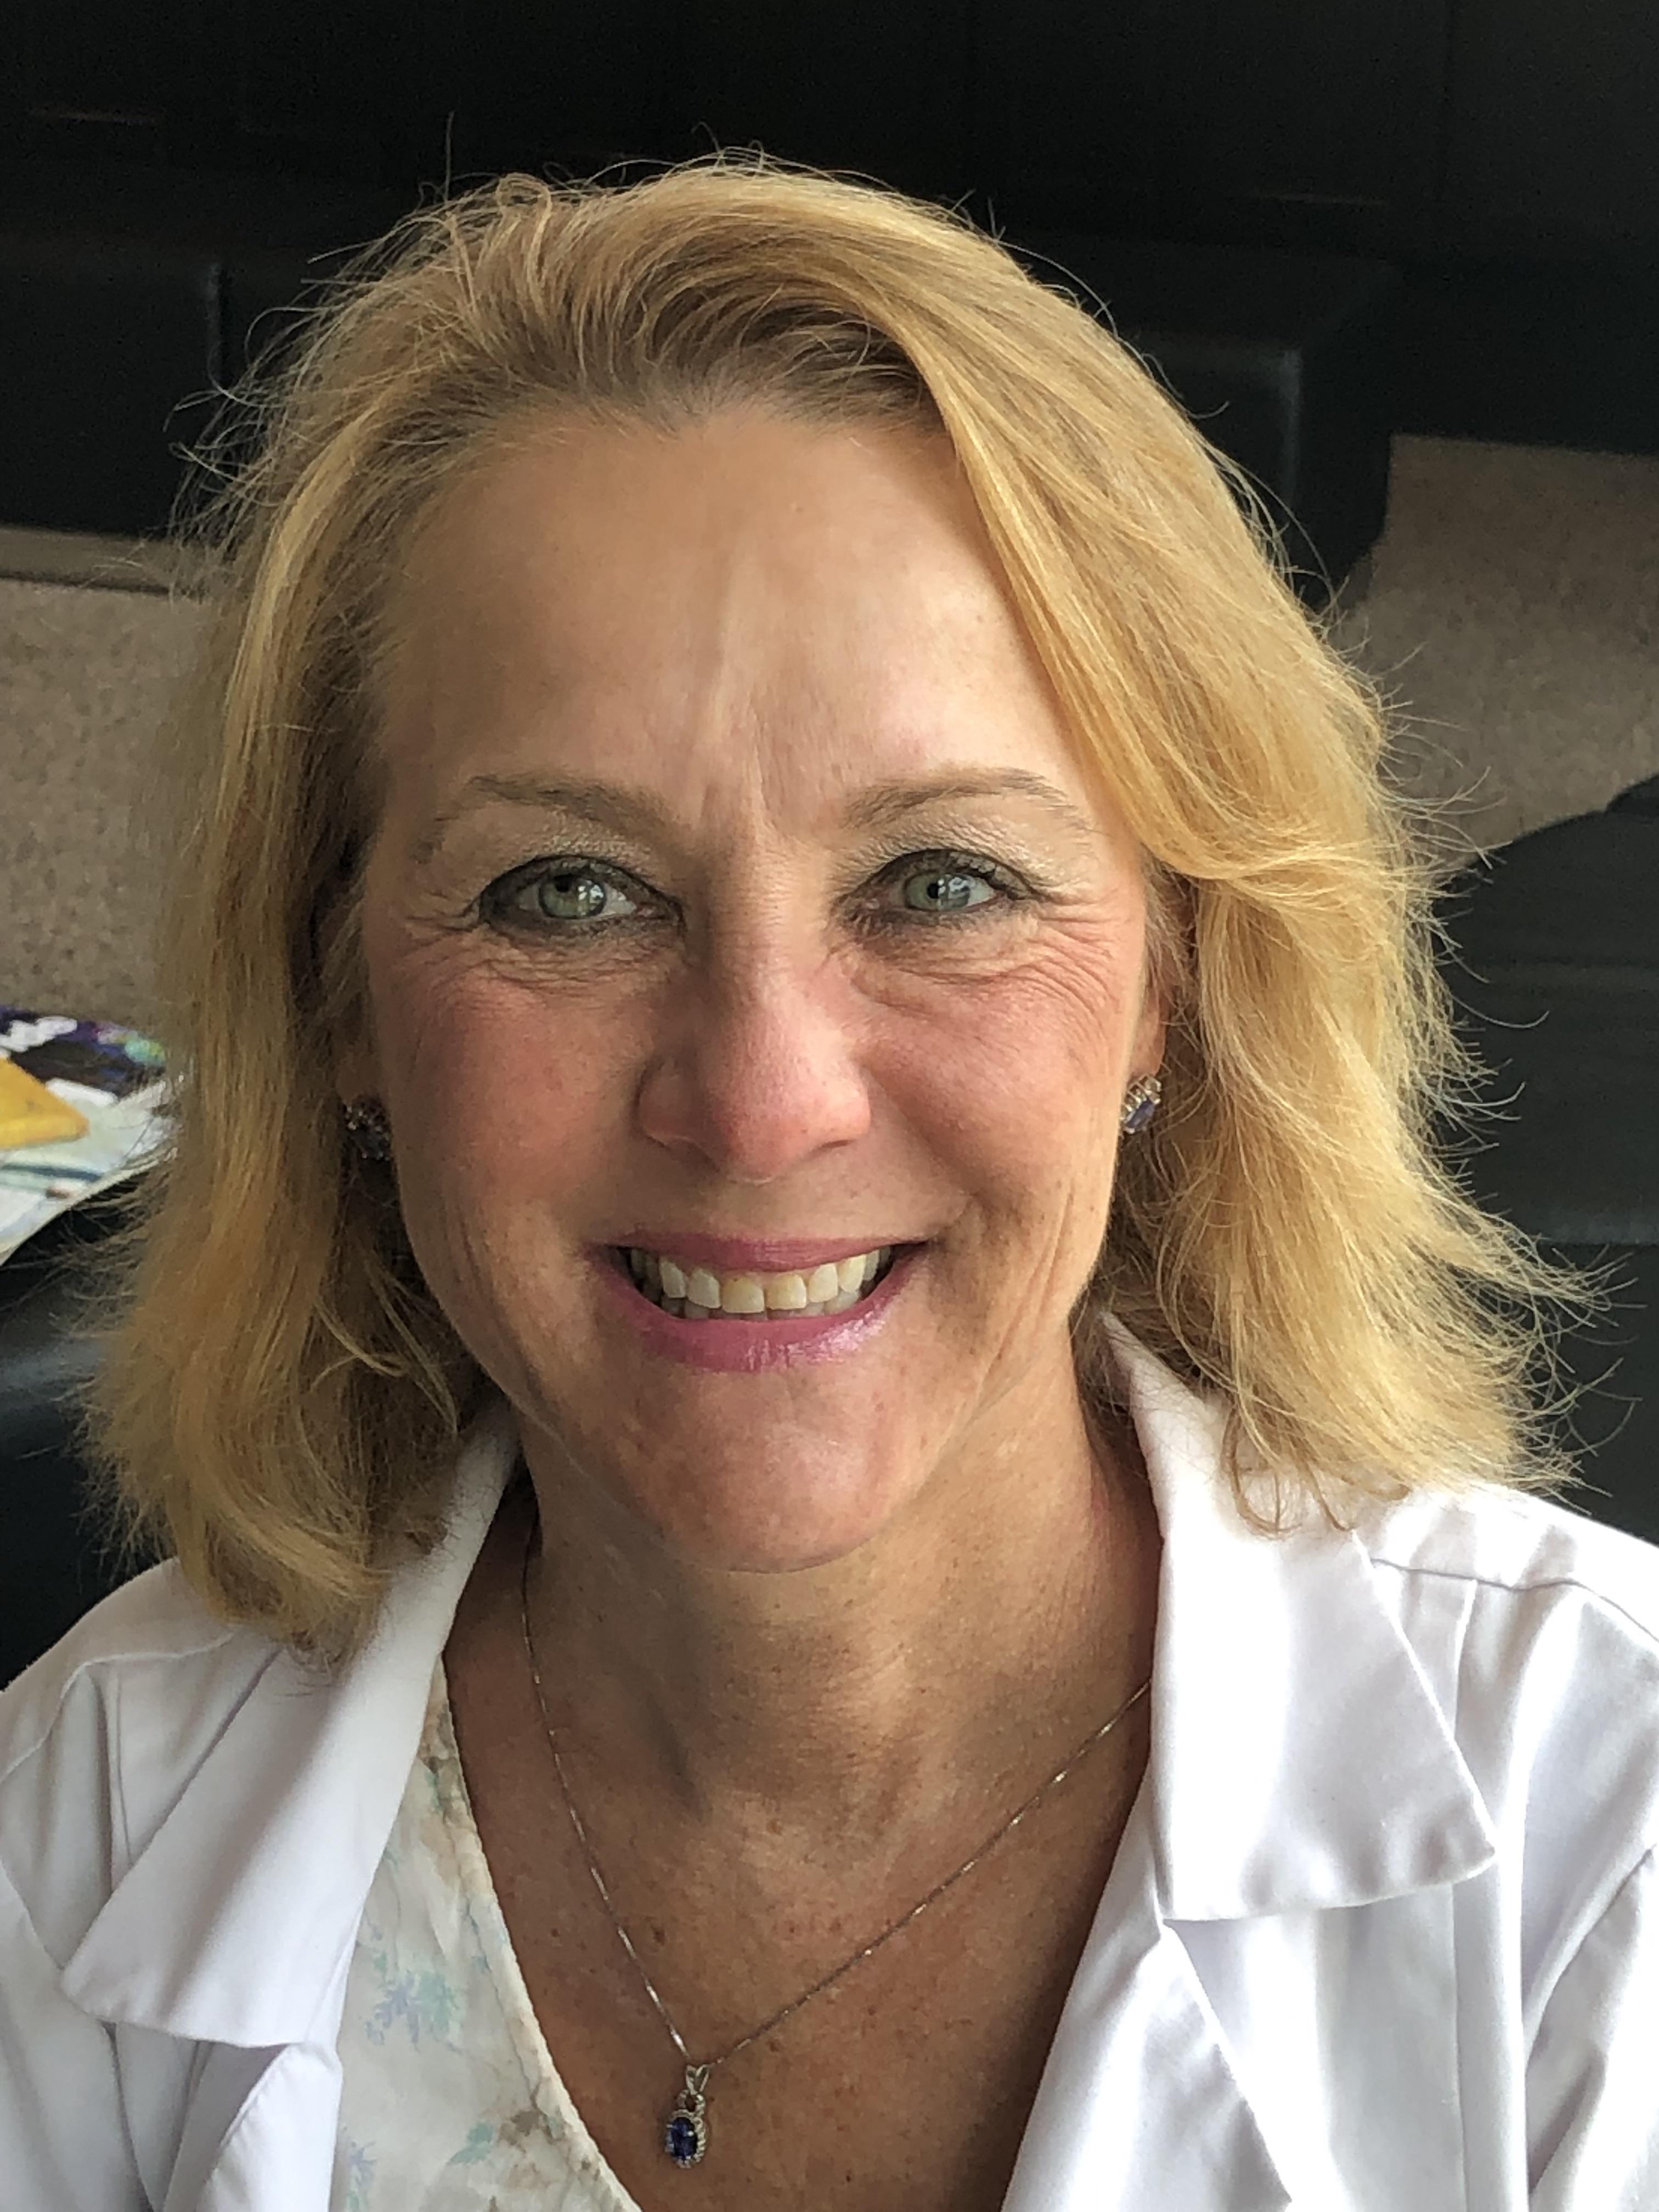 Retha Gracepointe nurse practioner